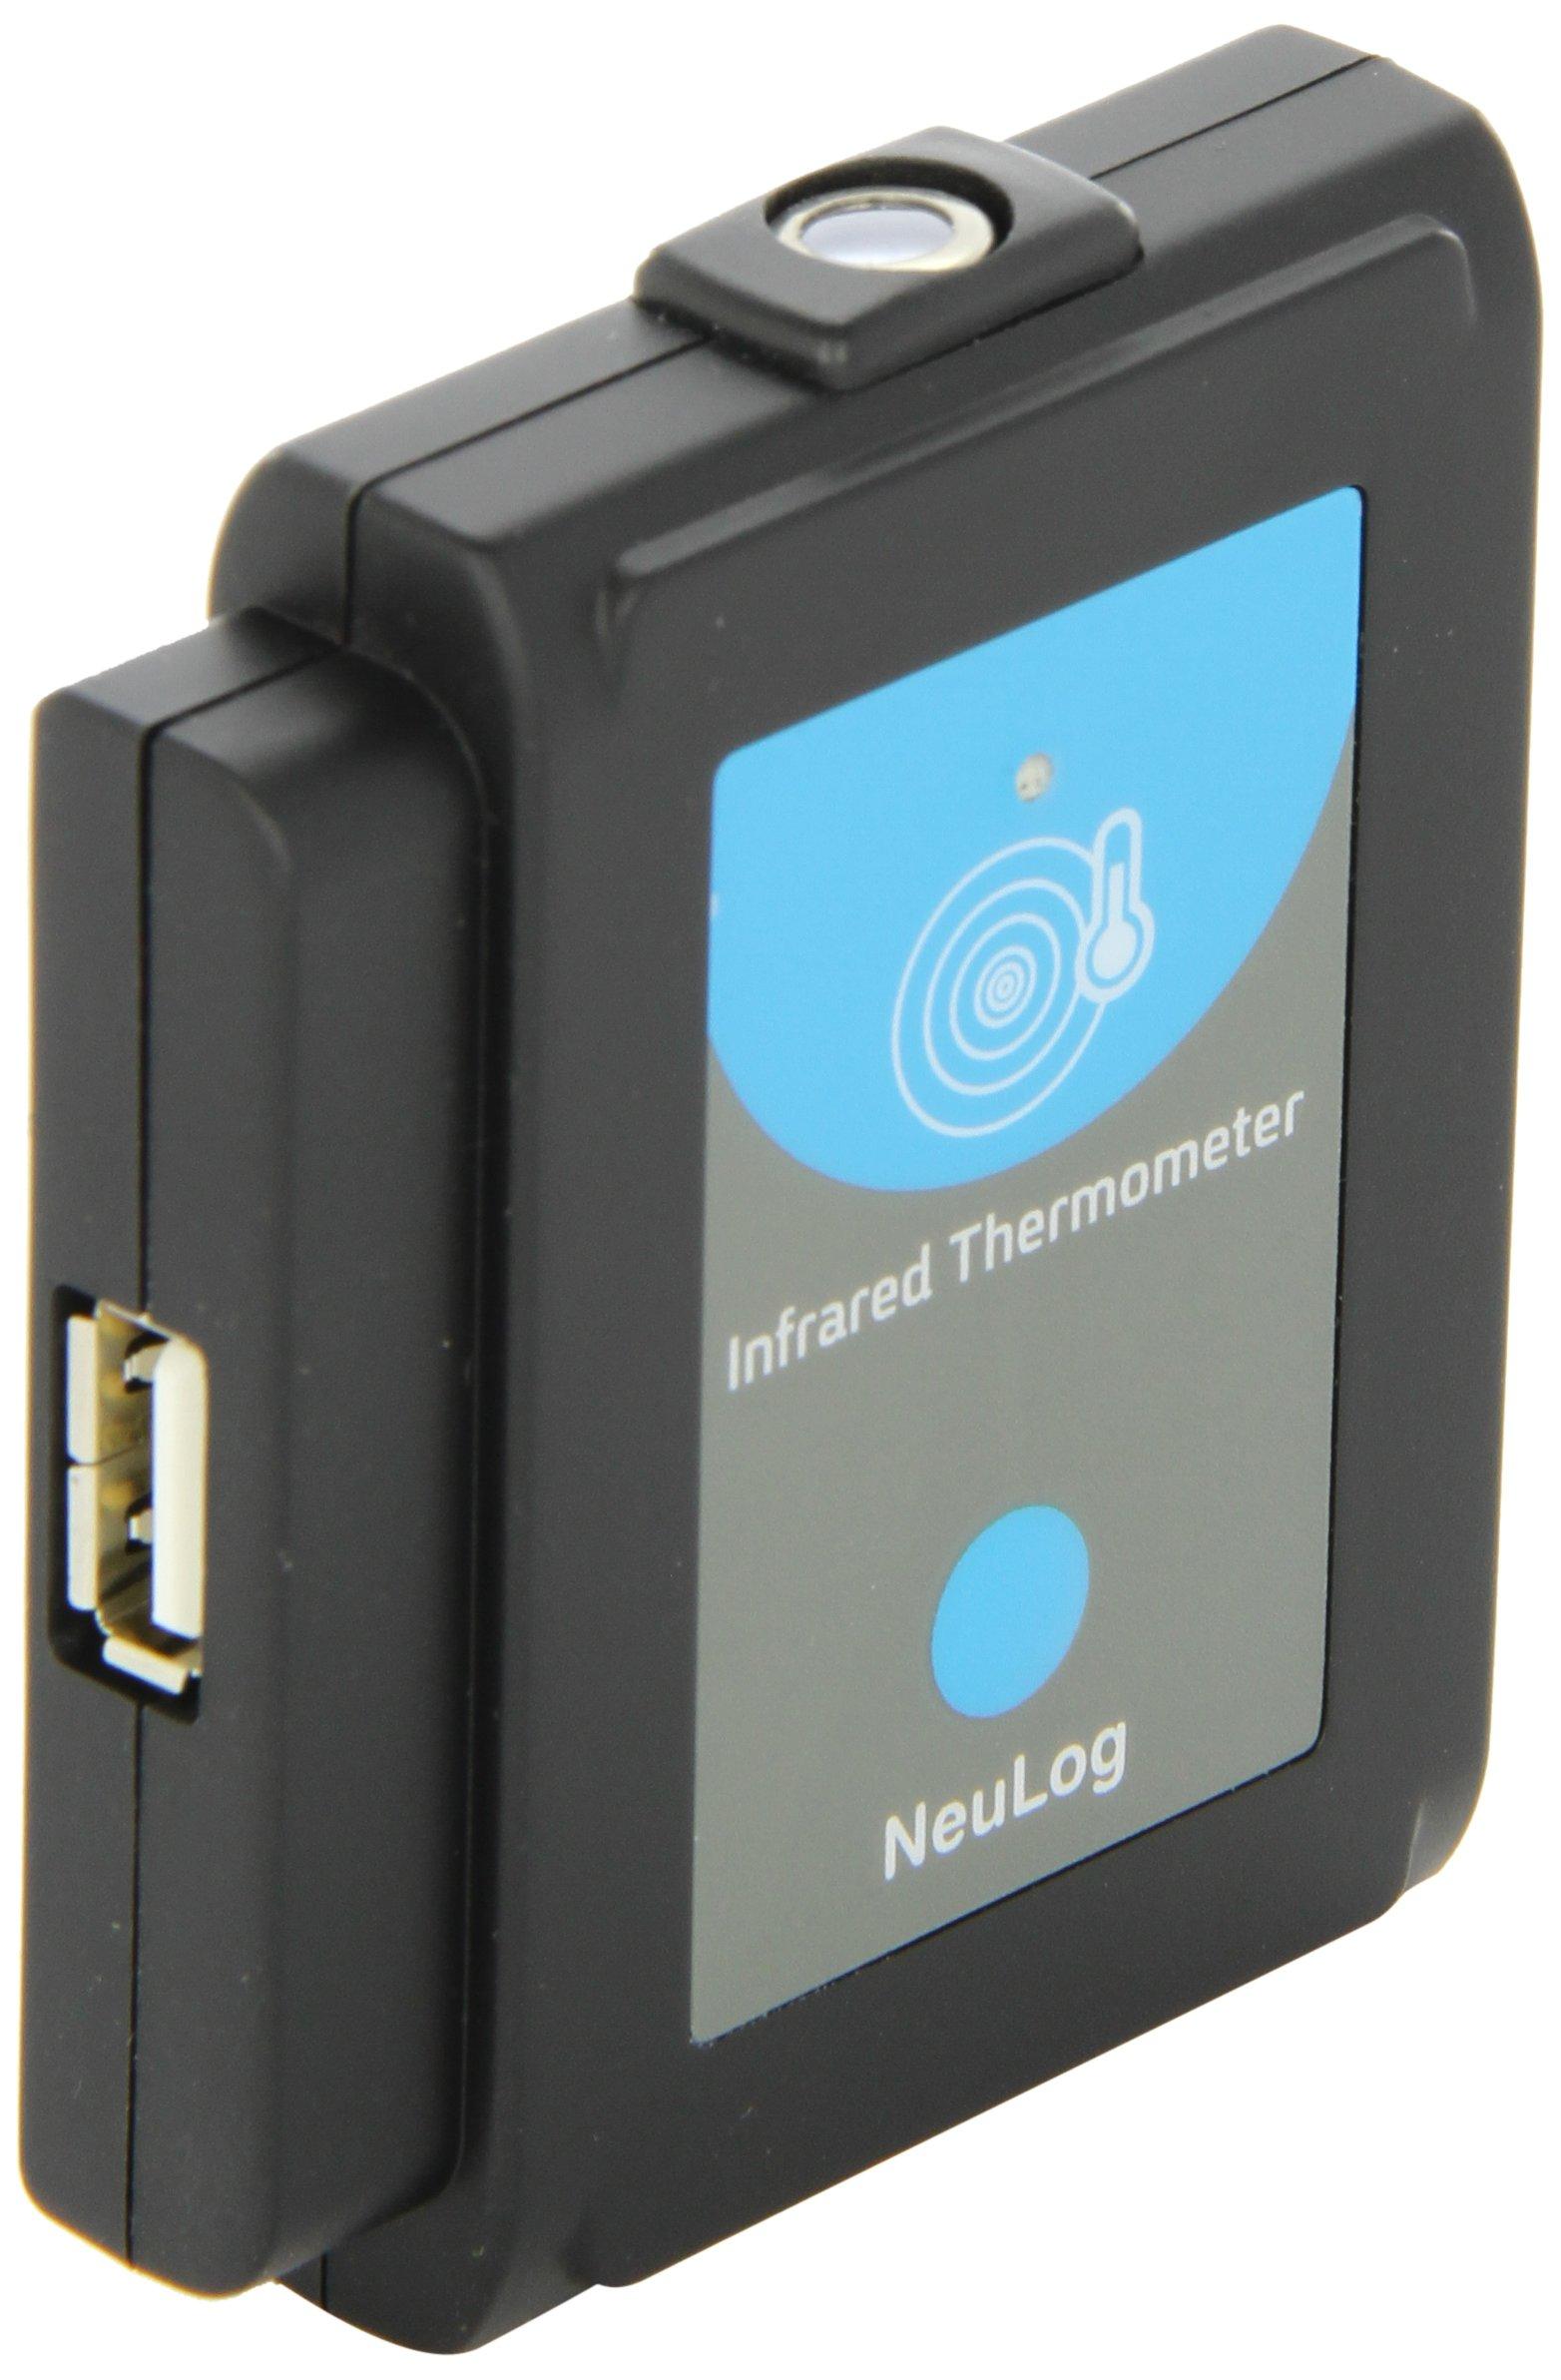 NEULOG Infrared Thermometer Logger Sensor, 13 bit ADC Resolution, 100 S/sec Maximum Sample Rate